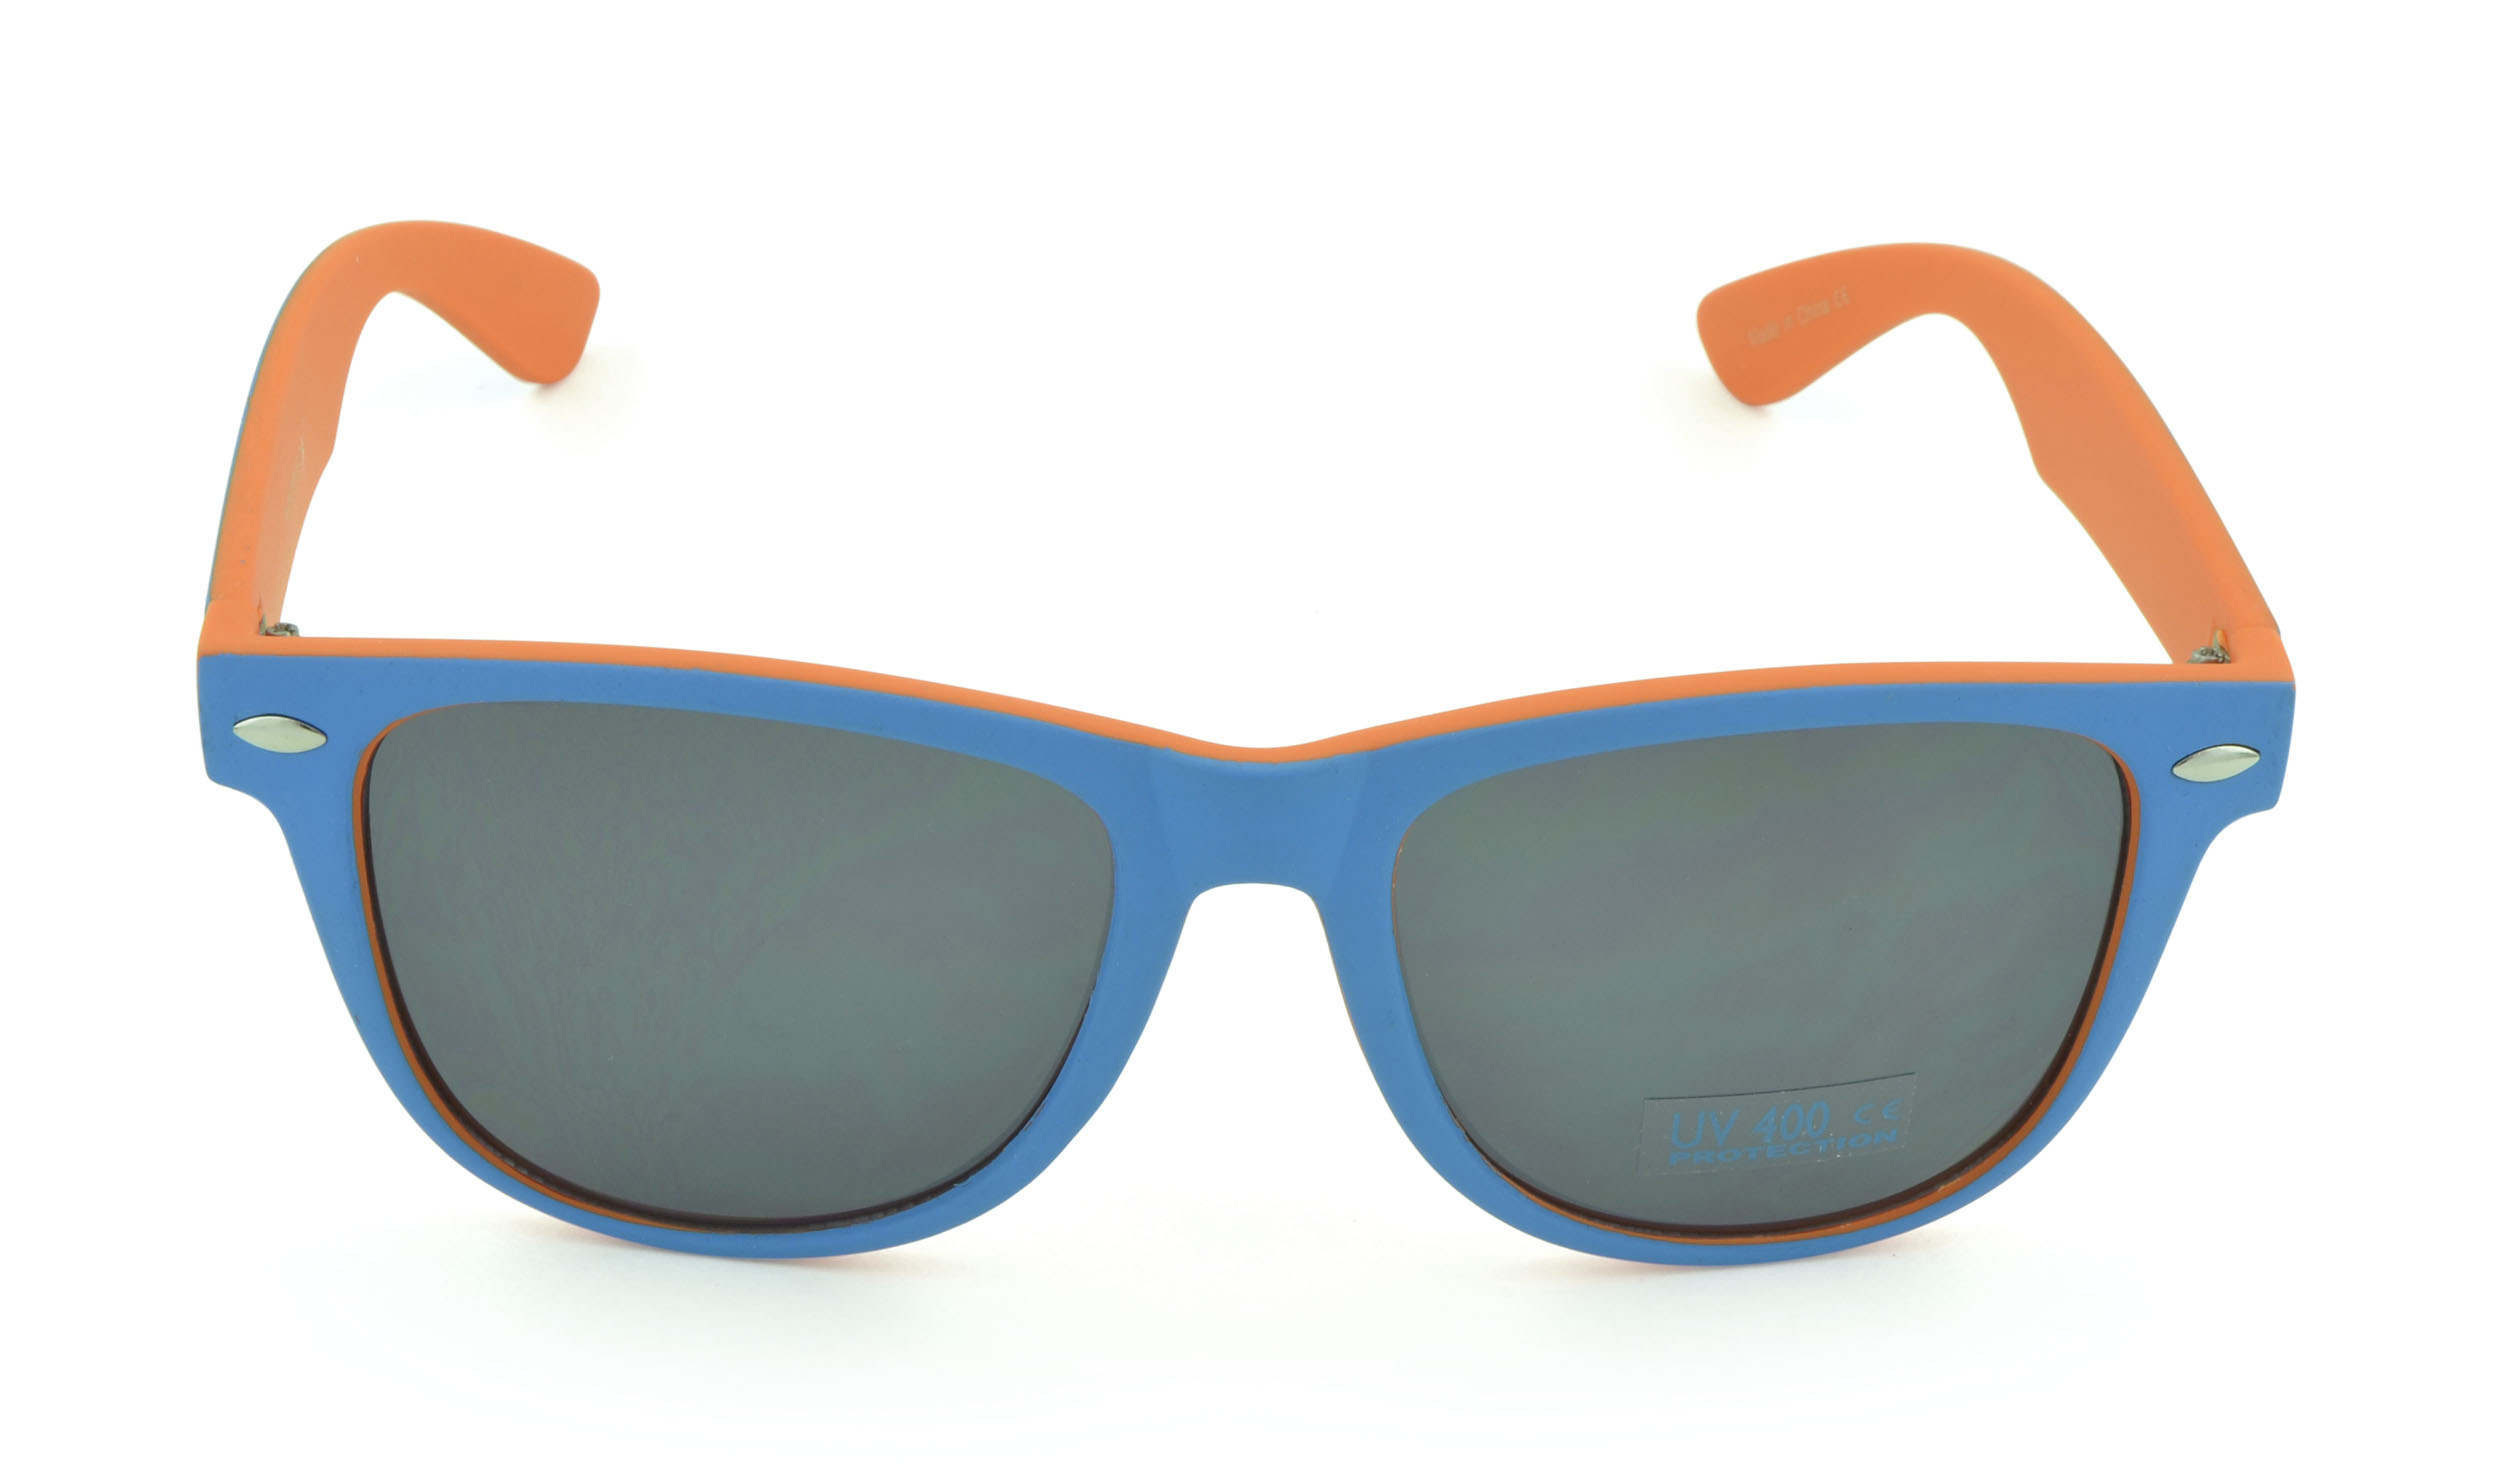 Belle Donne - Wayfarer Sunglasses Trendy Cheap Sunglasses High Quality - Womens Mens GIrls Boys Unisex Sunglasses - Orange